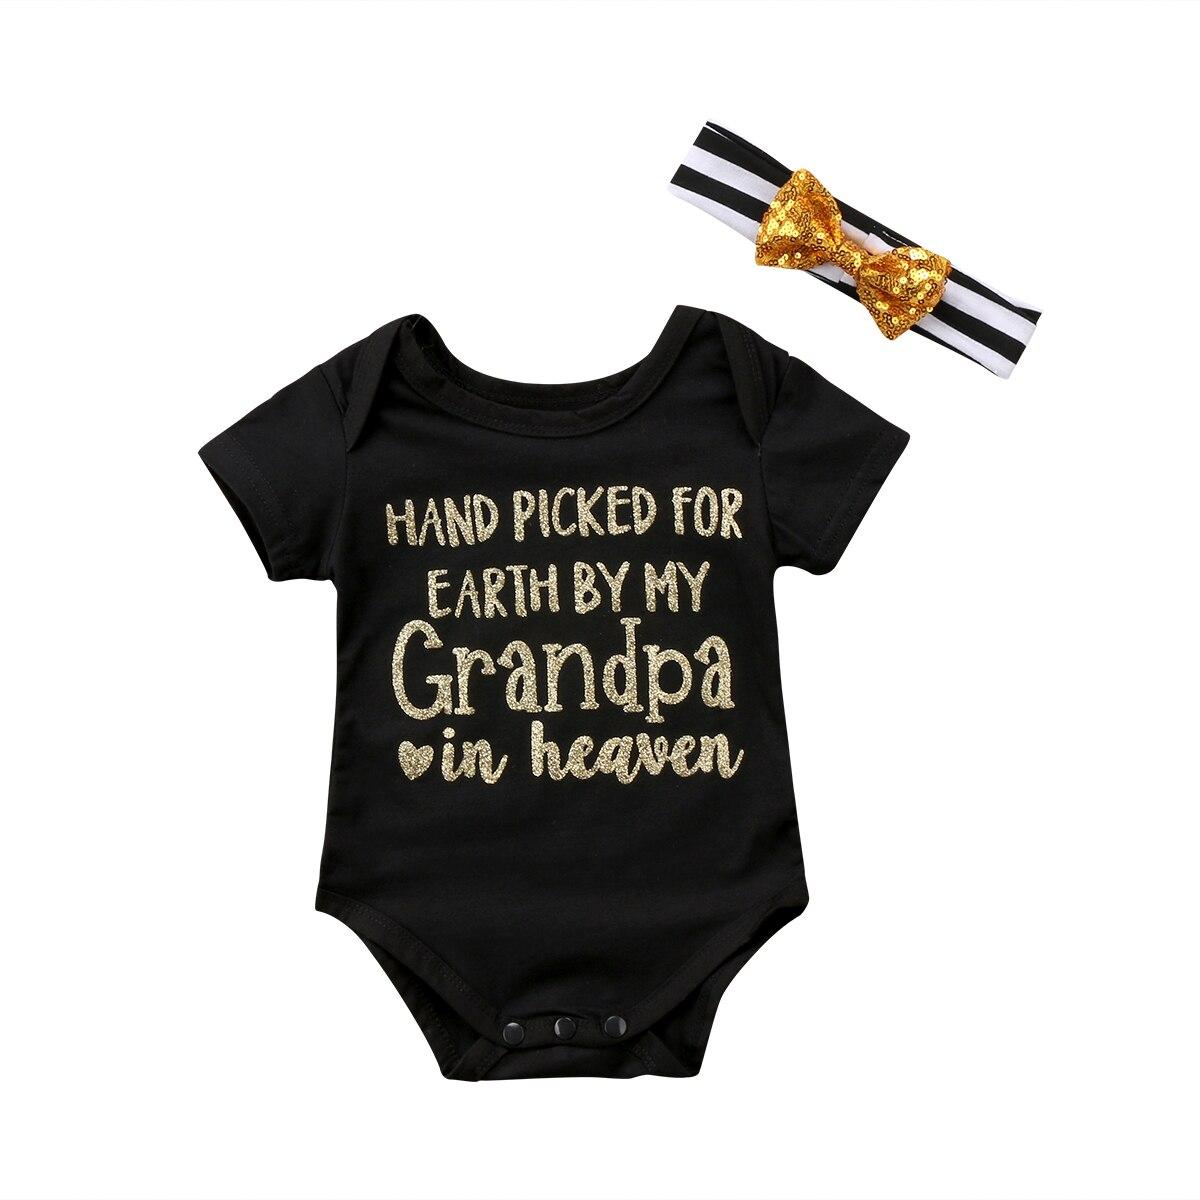 2018 Newborn Baby Girl   Romper   Short Sleeve Grandma Grandpa Sunsuit Clothes